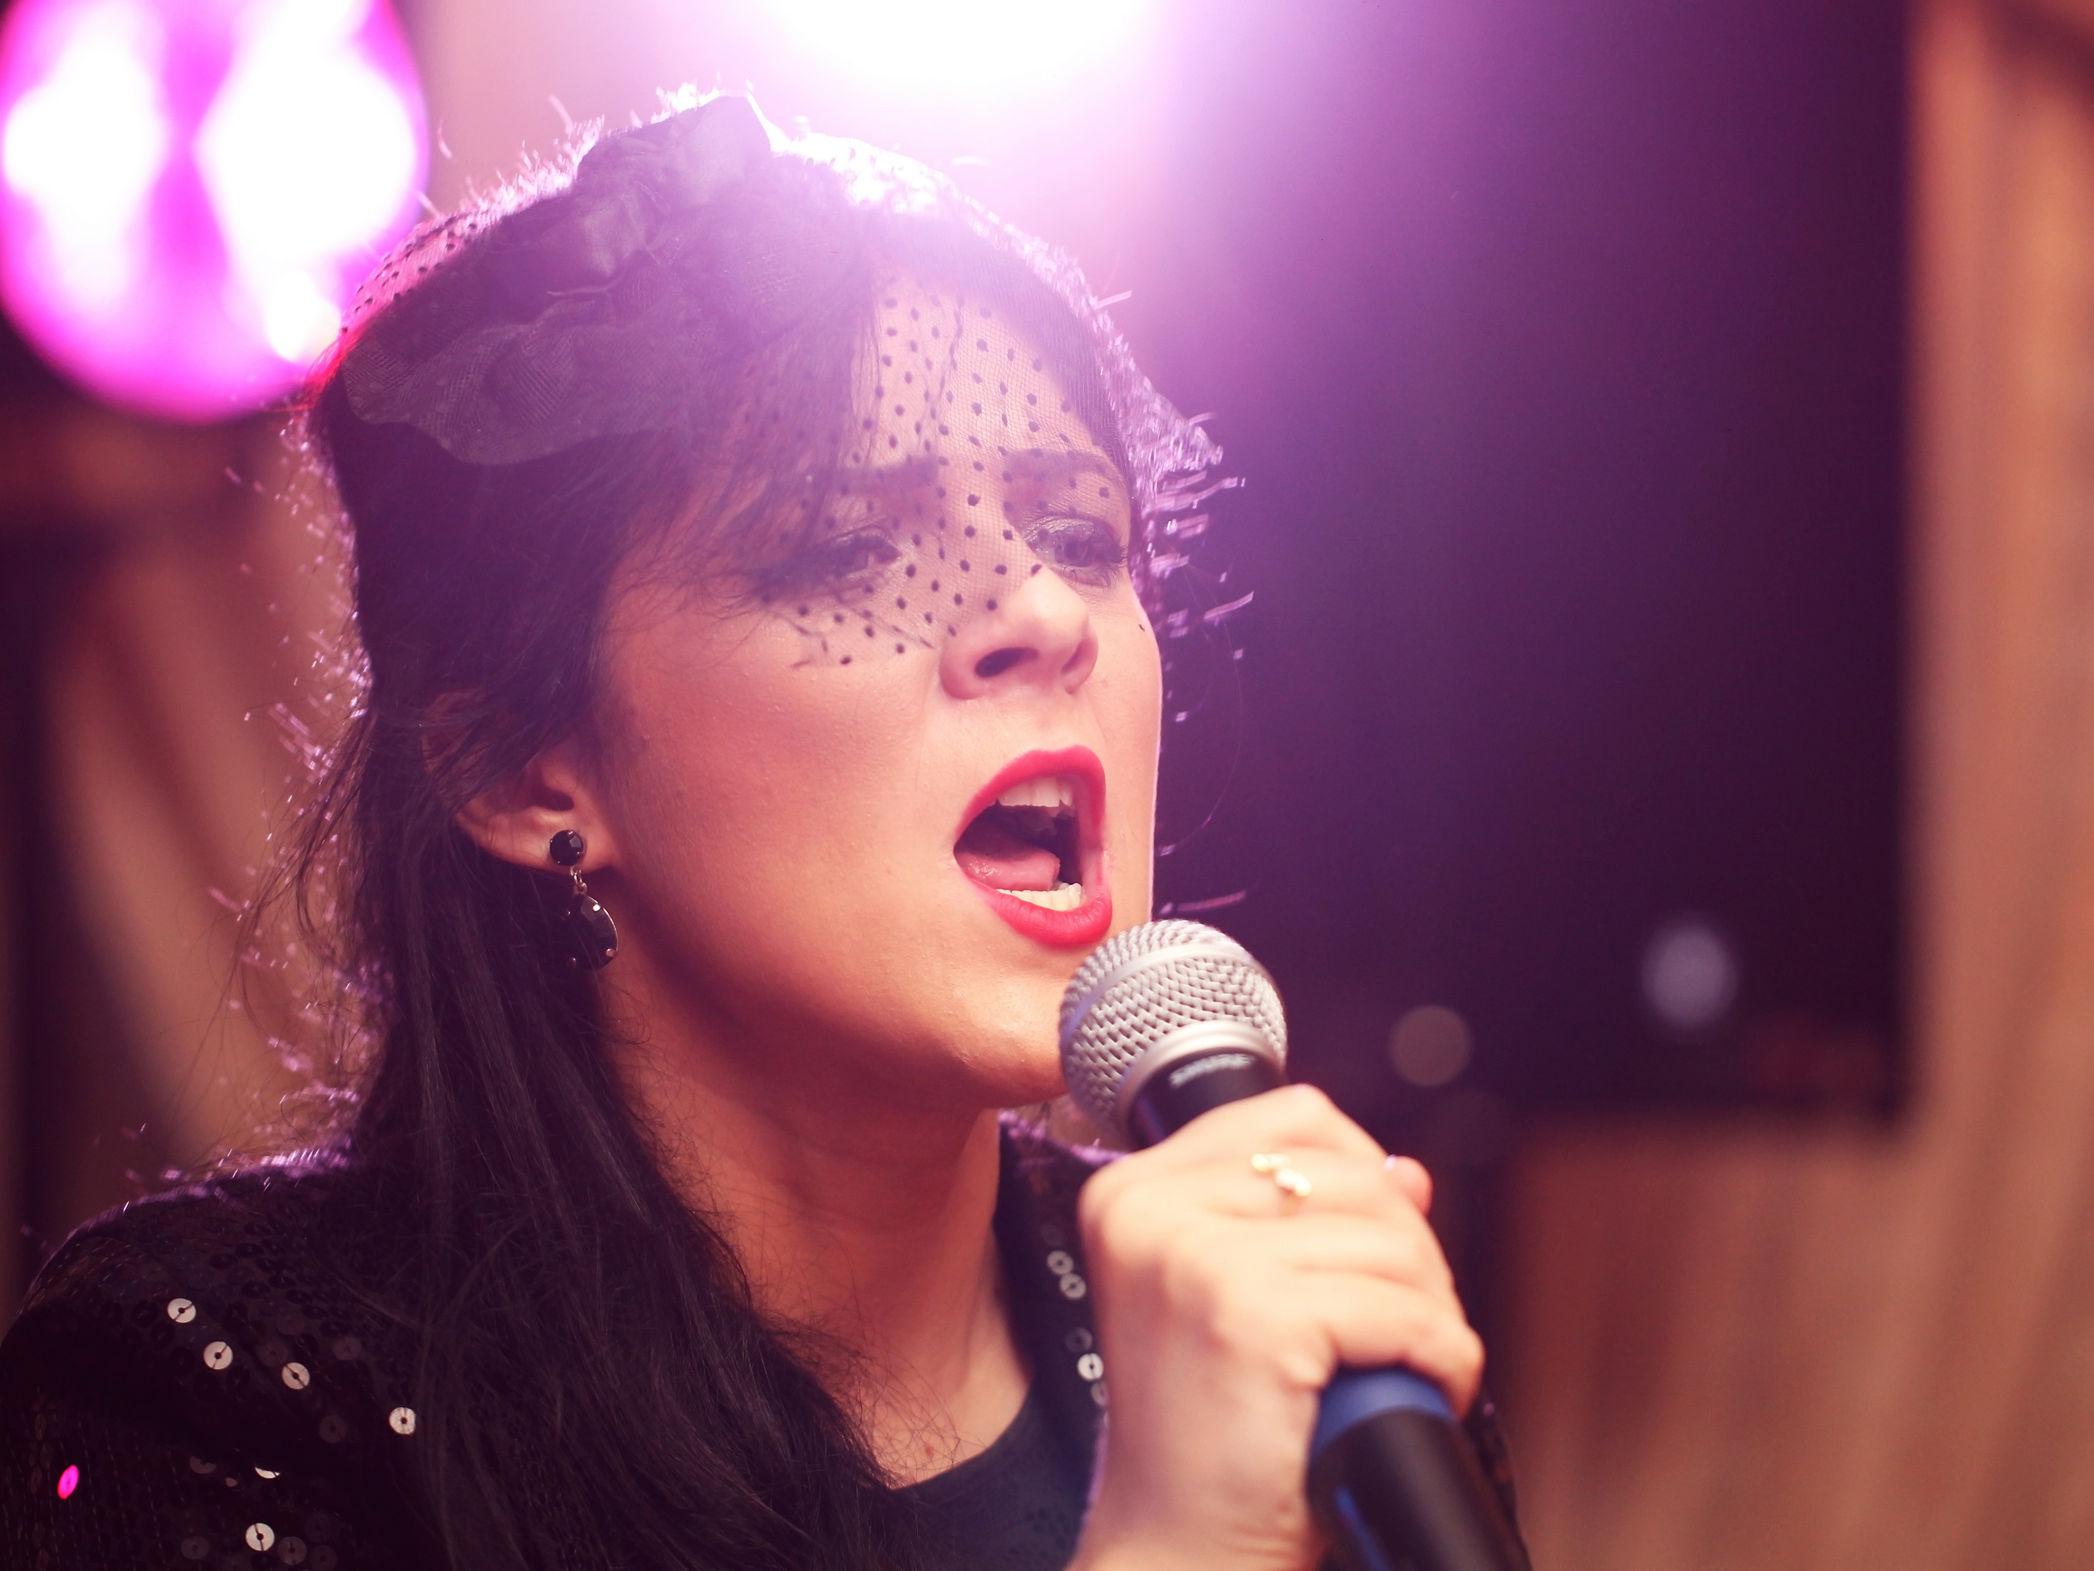 Karaoke | Maschine | Karaoke | Automat | Karaoke | Anlage | Karaokeanlage | Karaoke | Songs | Leihen | Buchen | Mieten | Lehmann | Eventservice | Hannover